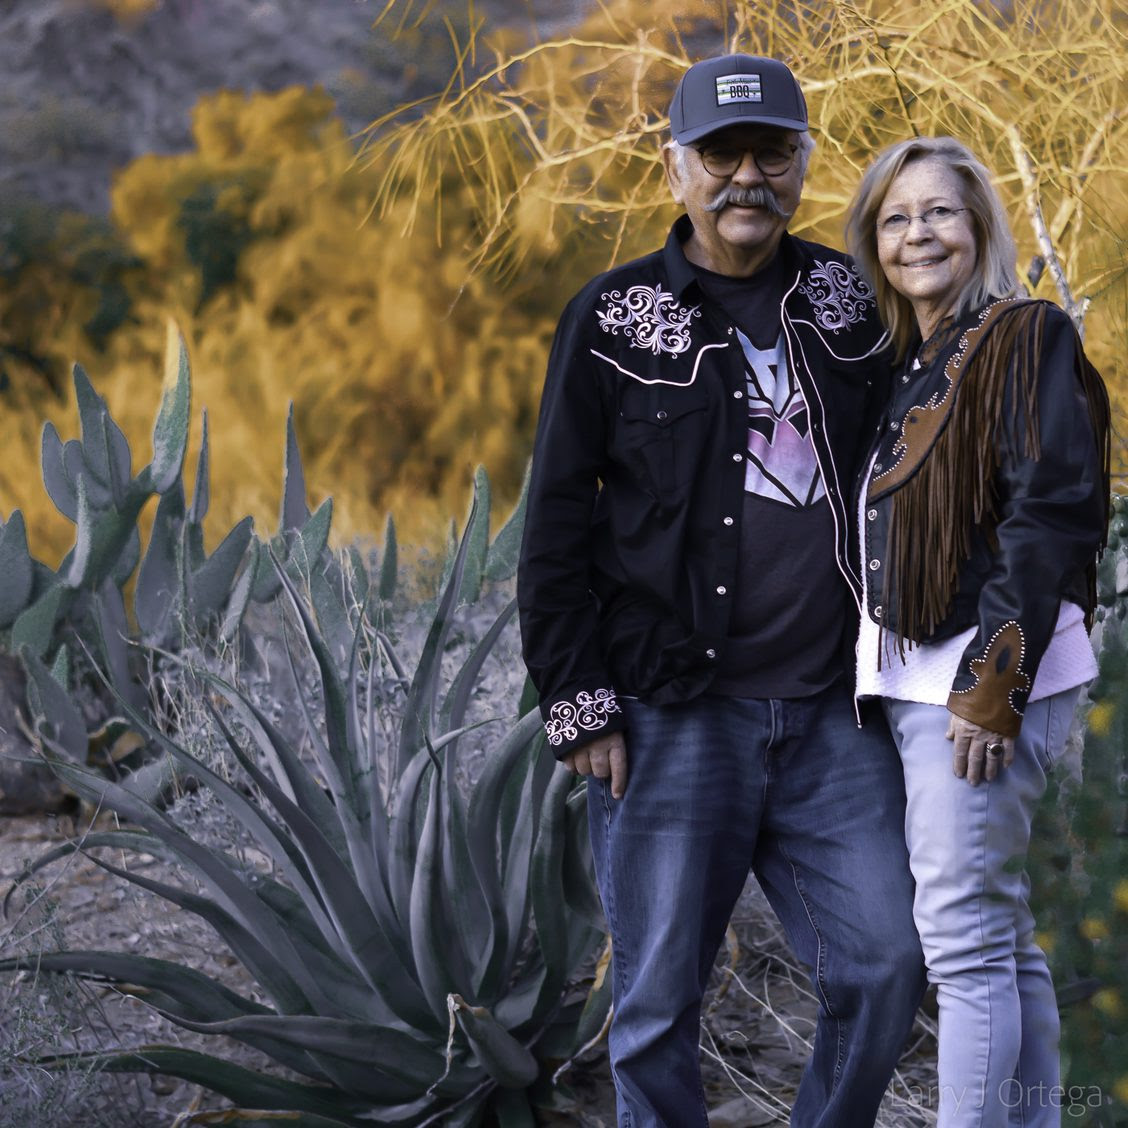 Larry and Sandra Ortega